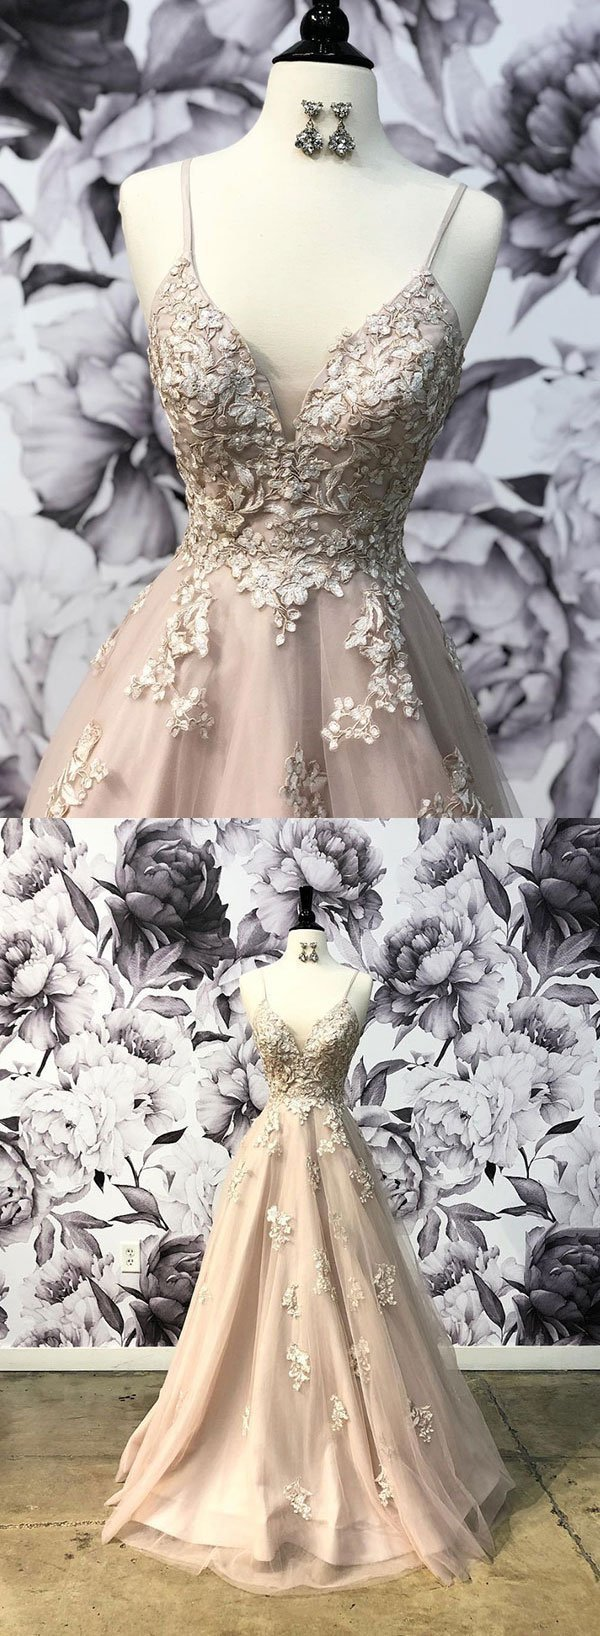 Stylish v neck tulle lace long prom dress, evening dress